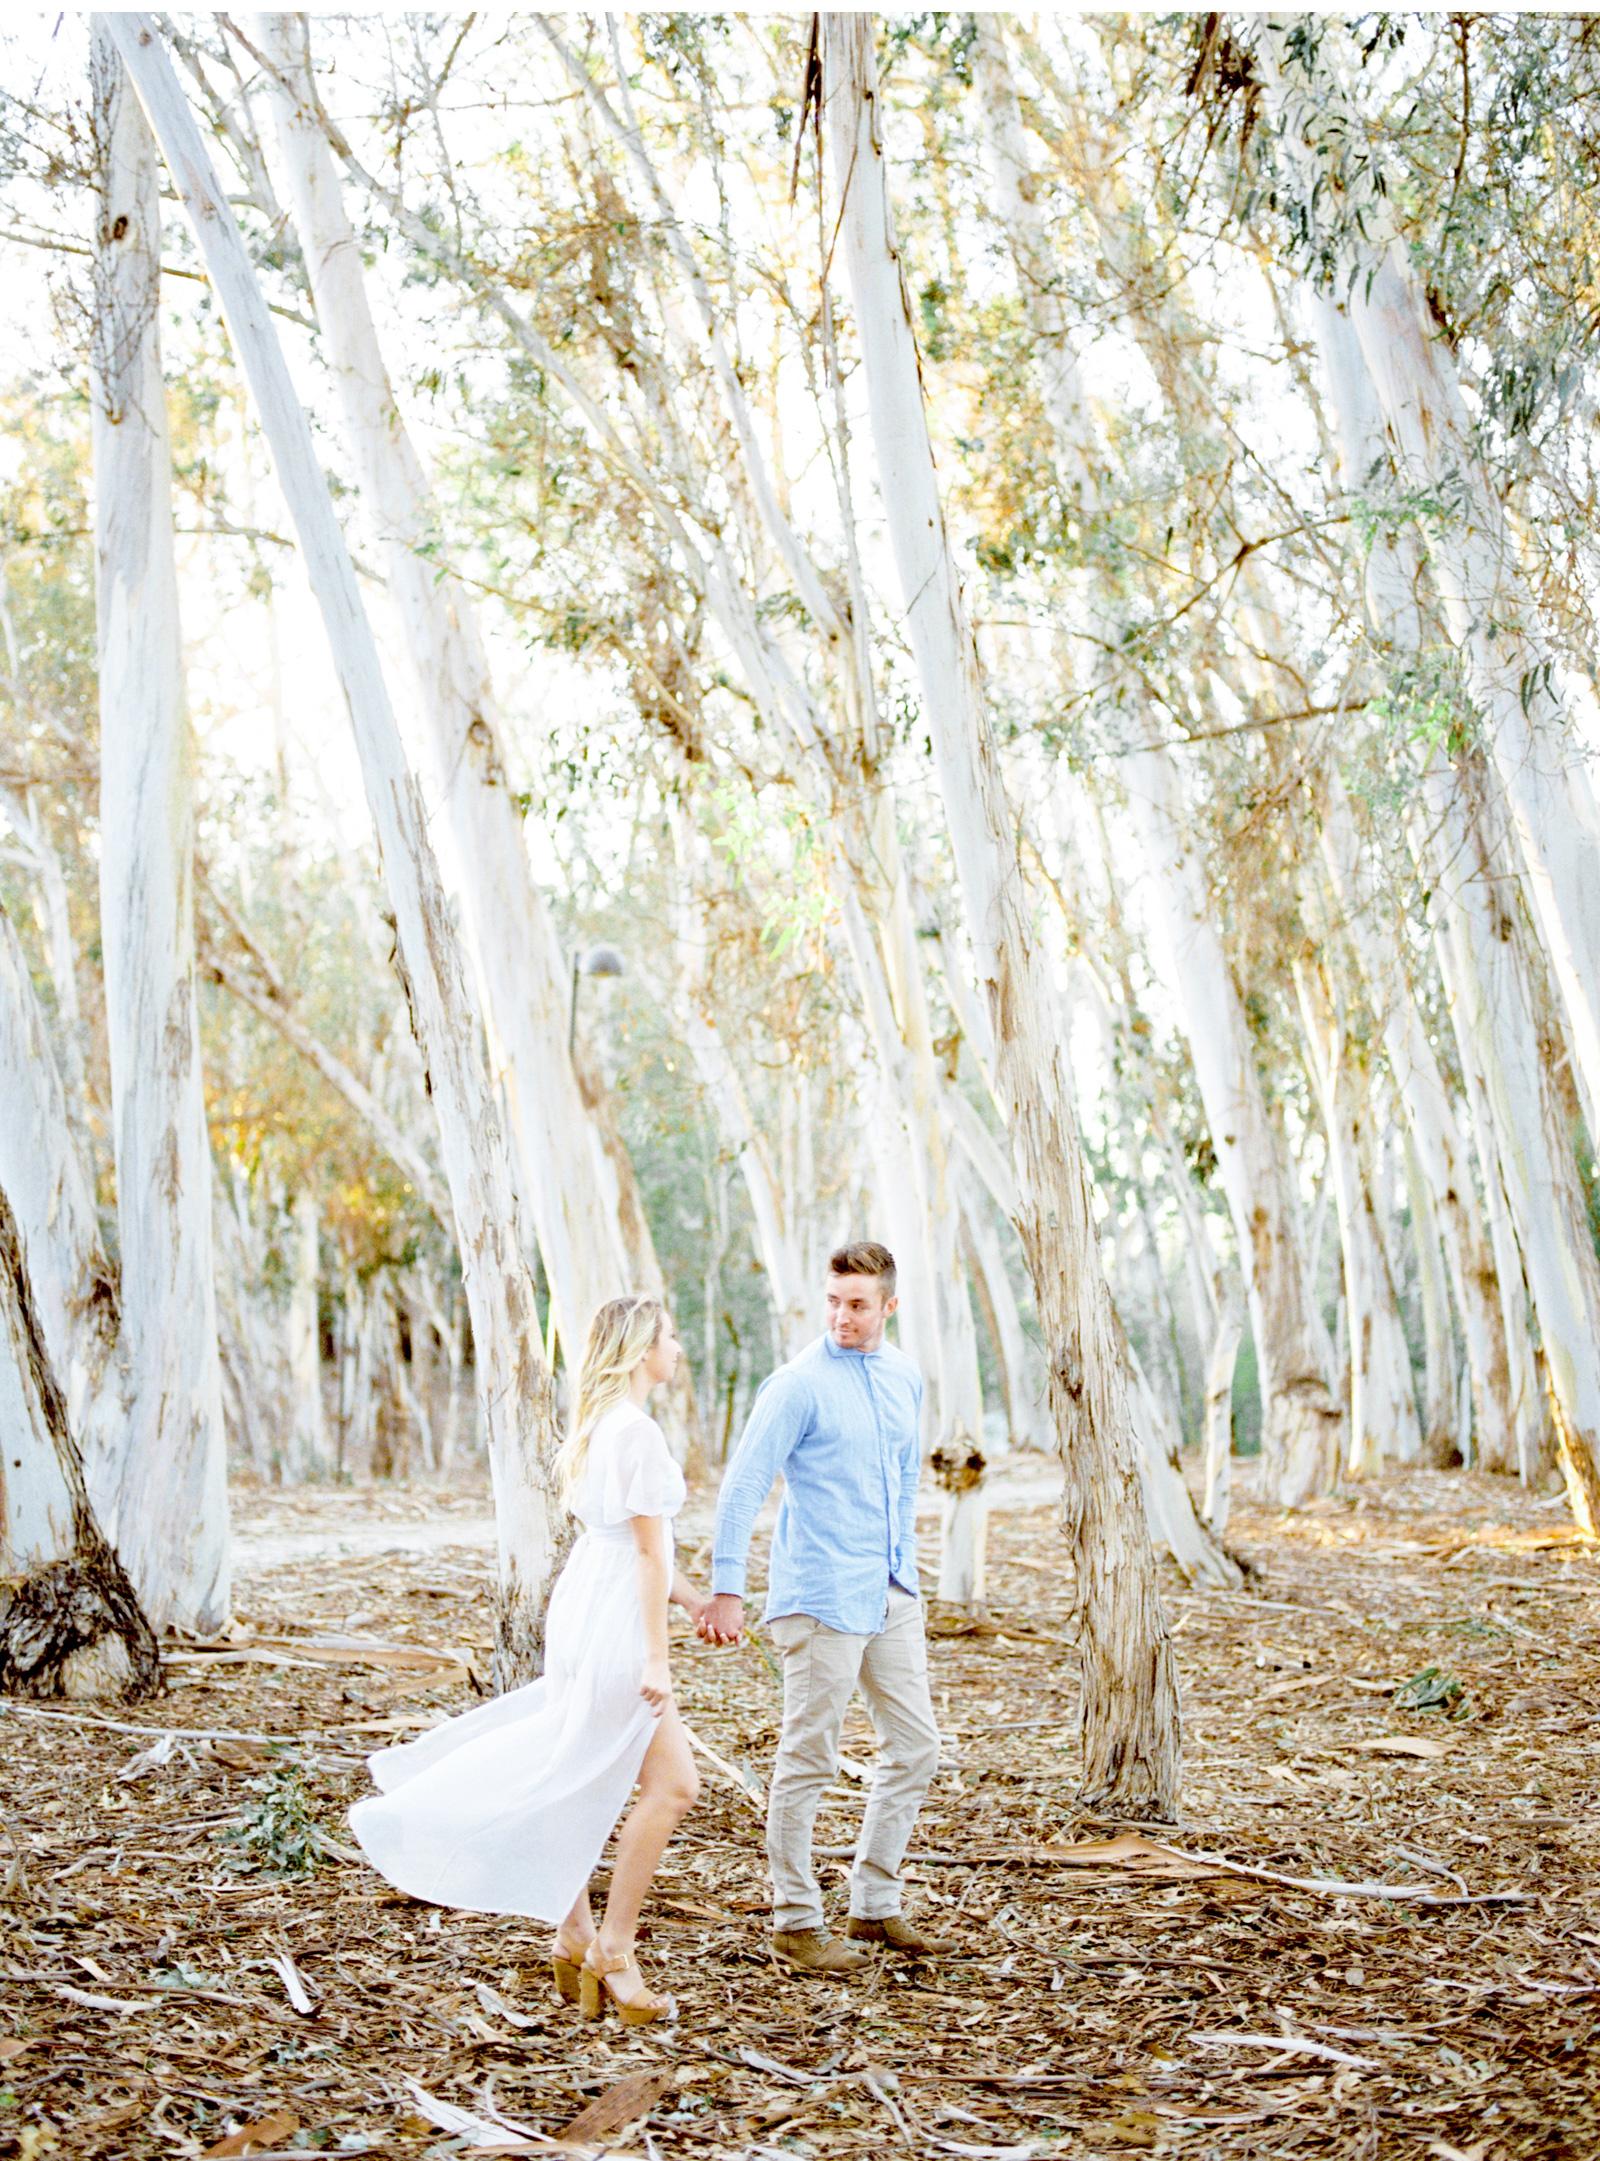 Style-Me-Pretty-Wedding-Natalie-Schutt-Photography_01.jpg